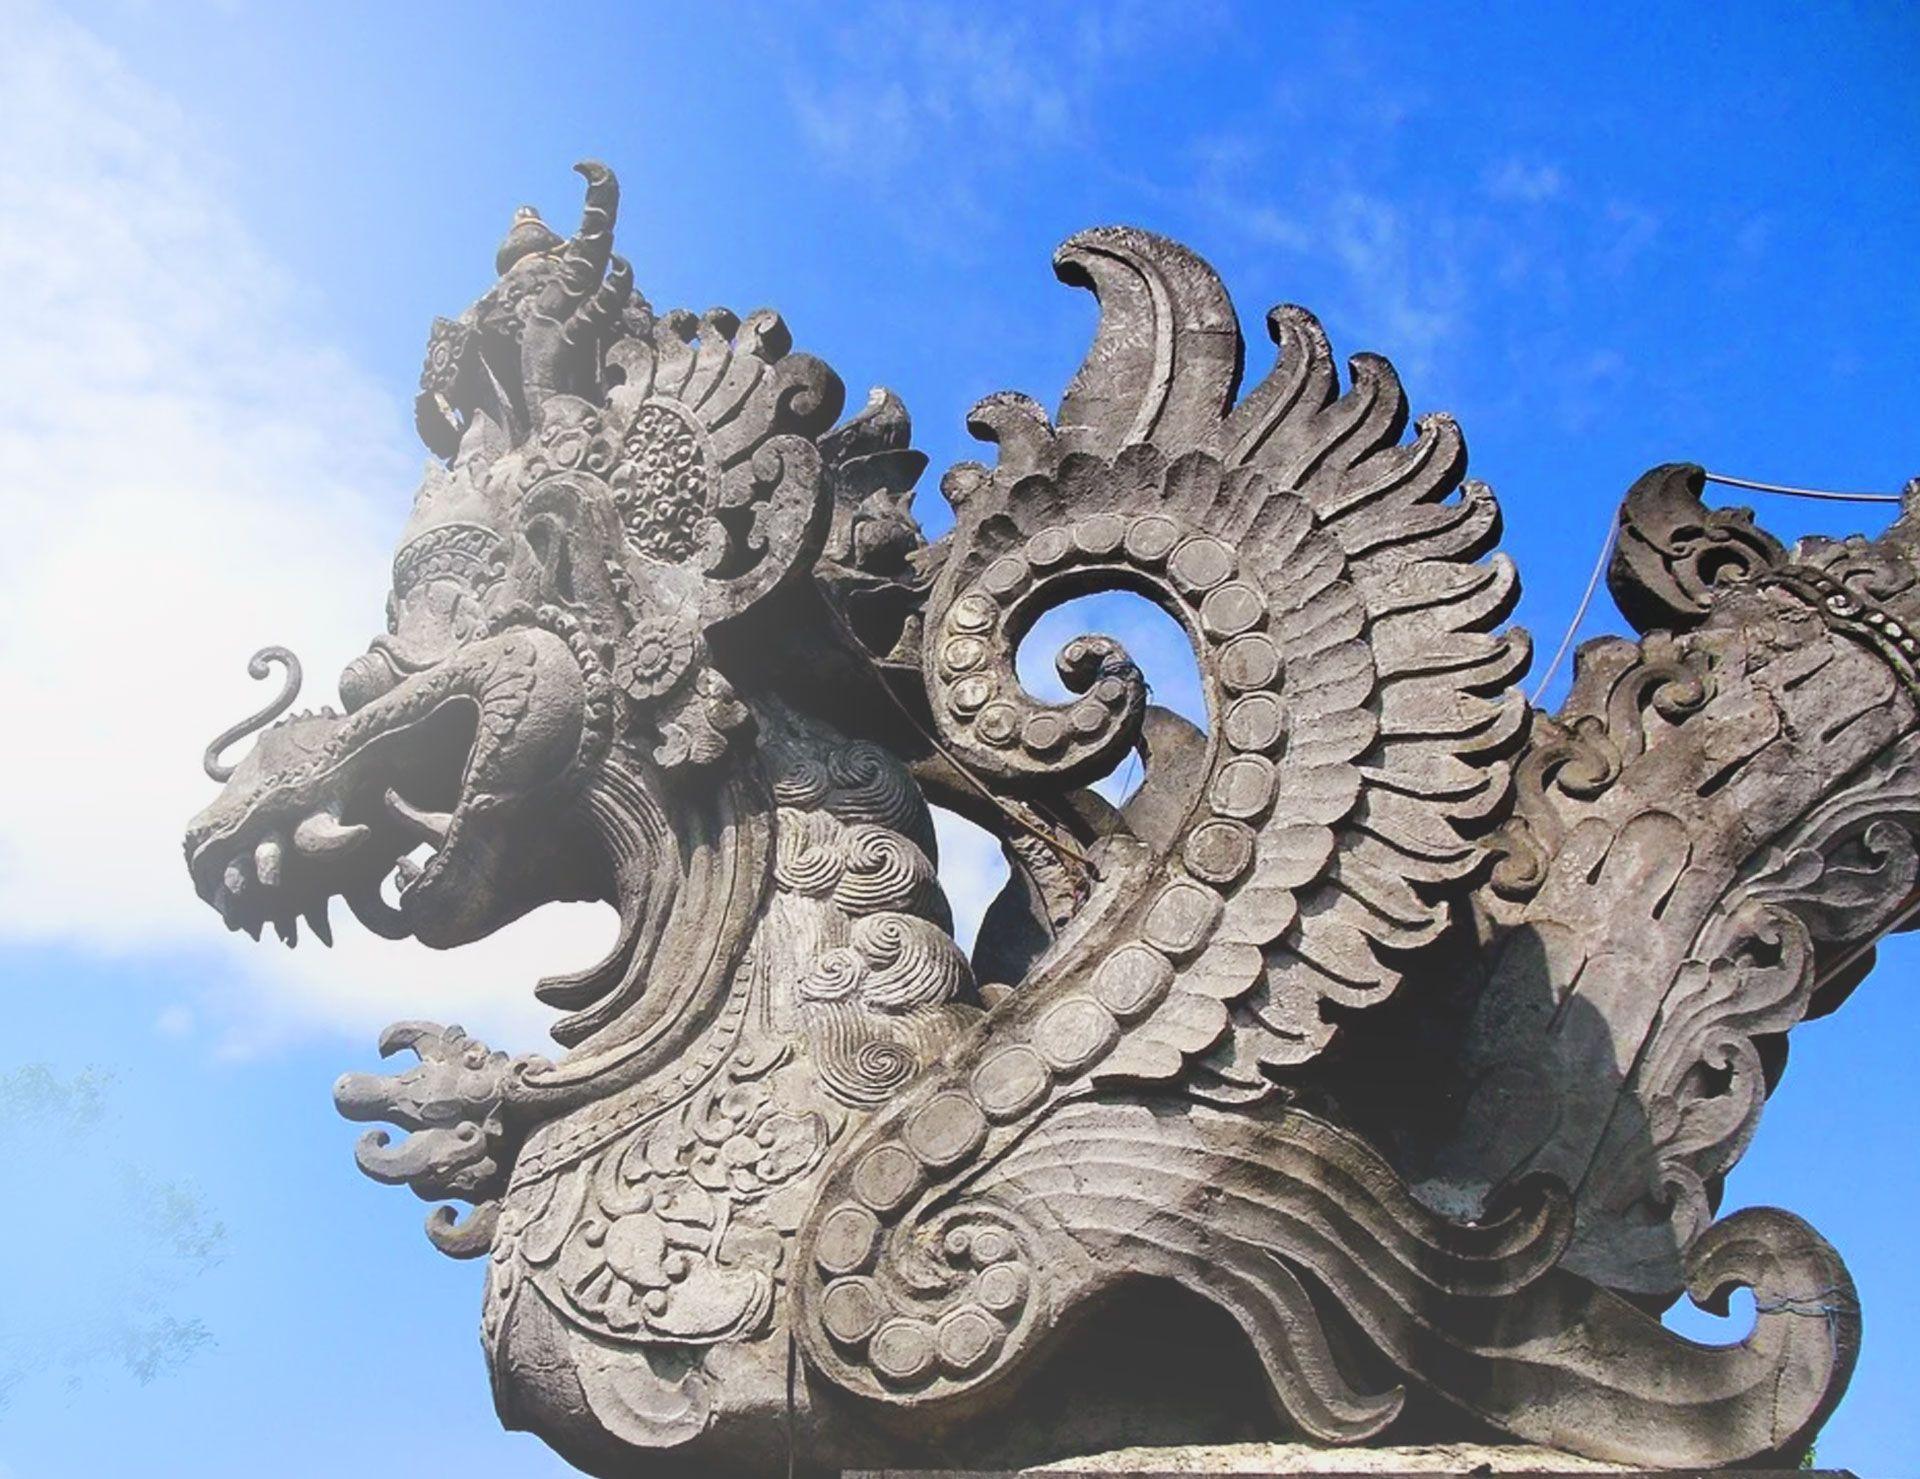 Makna Kultural Pada Garuda Pancasila